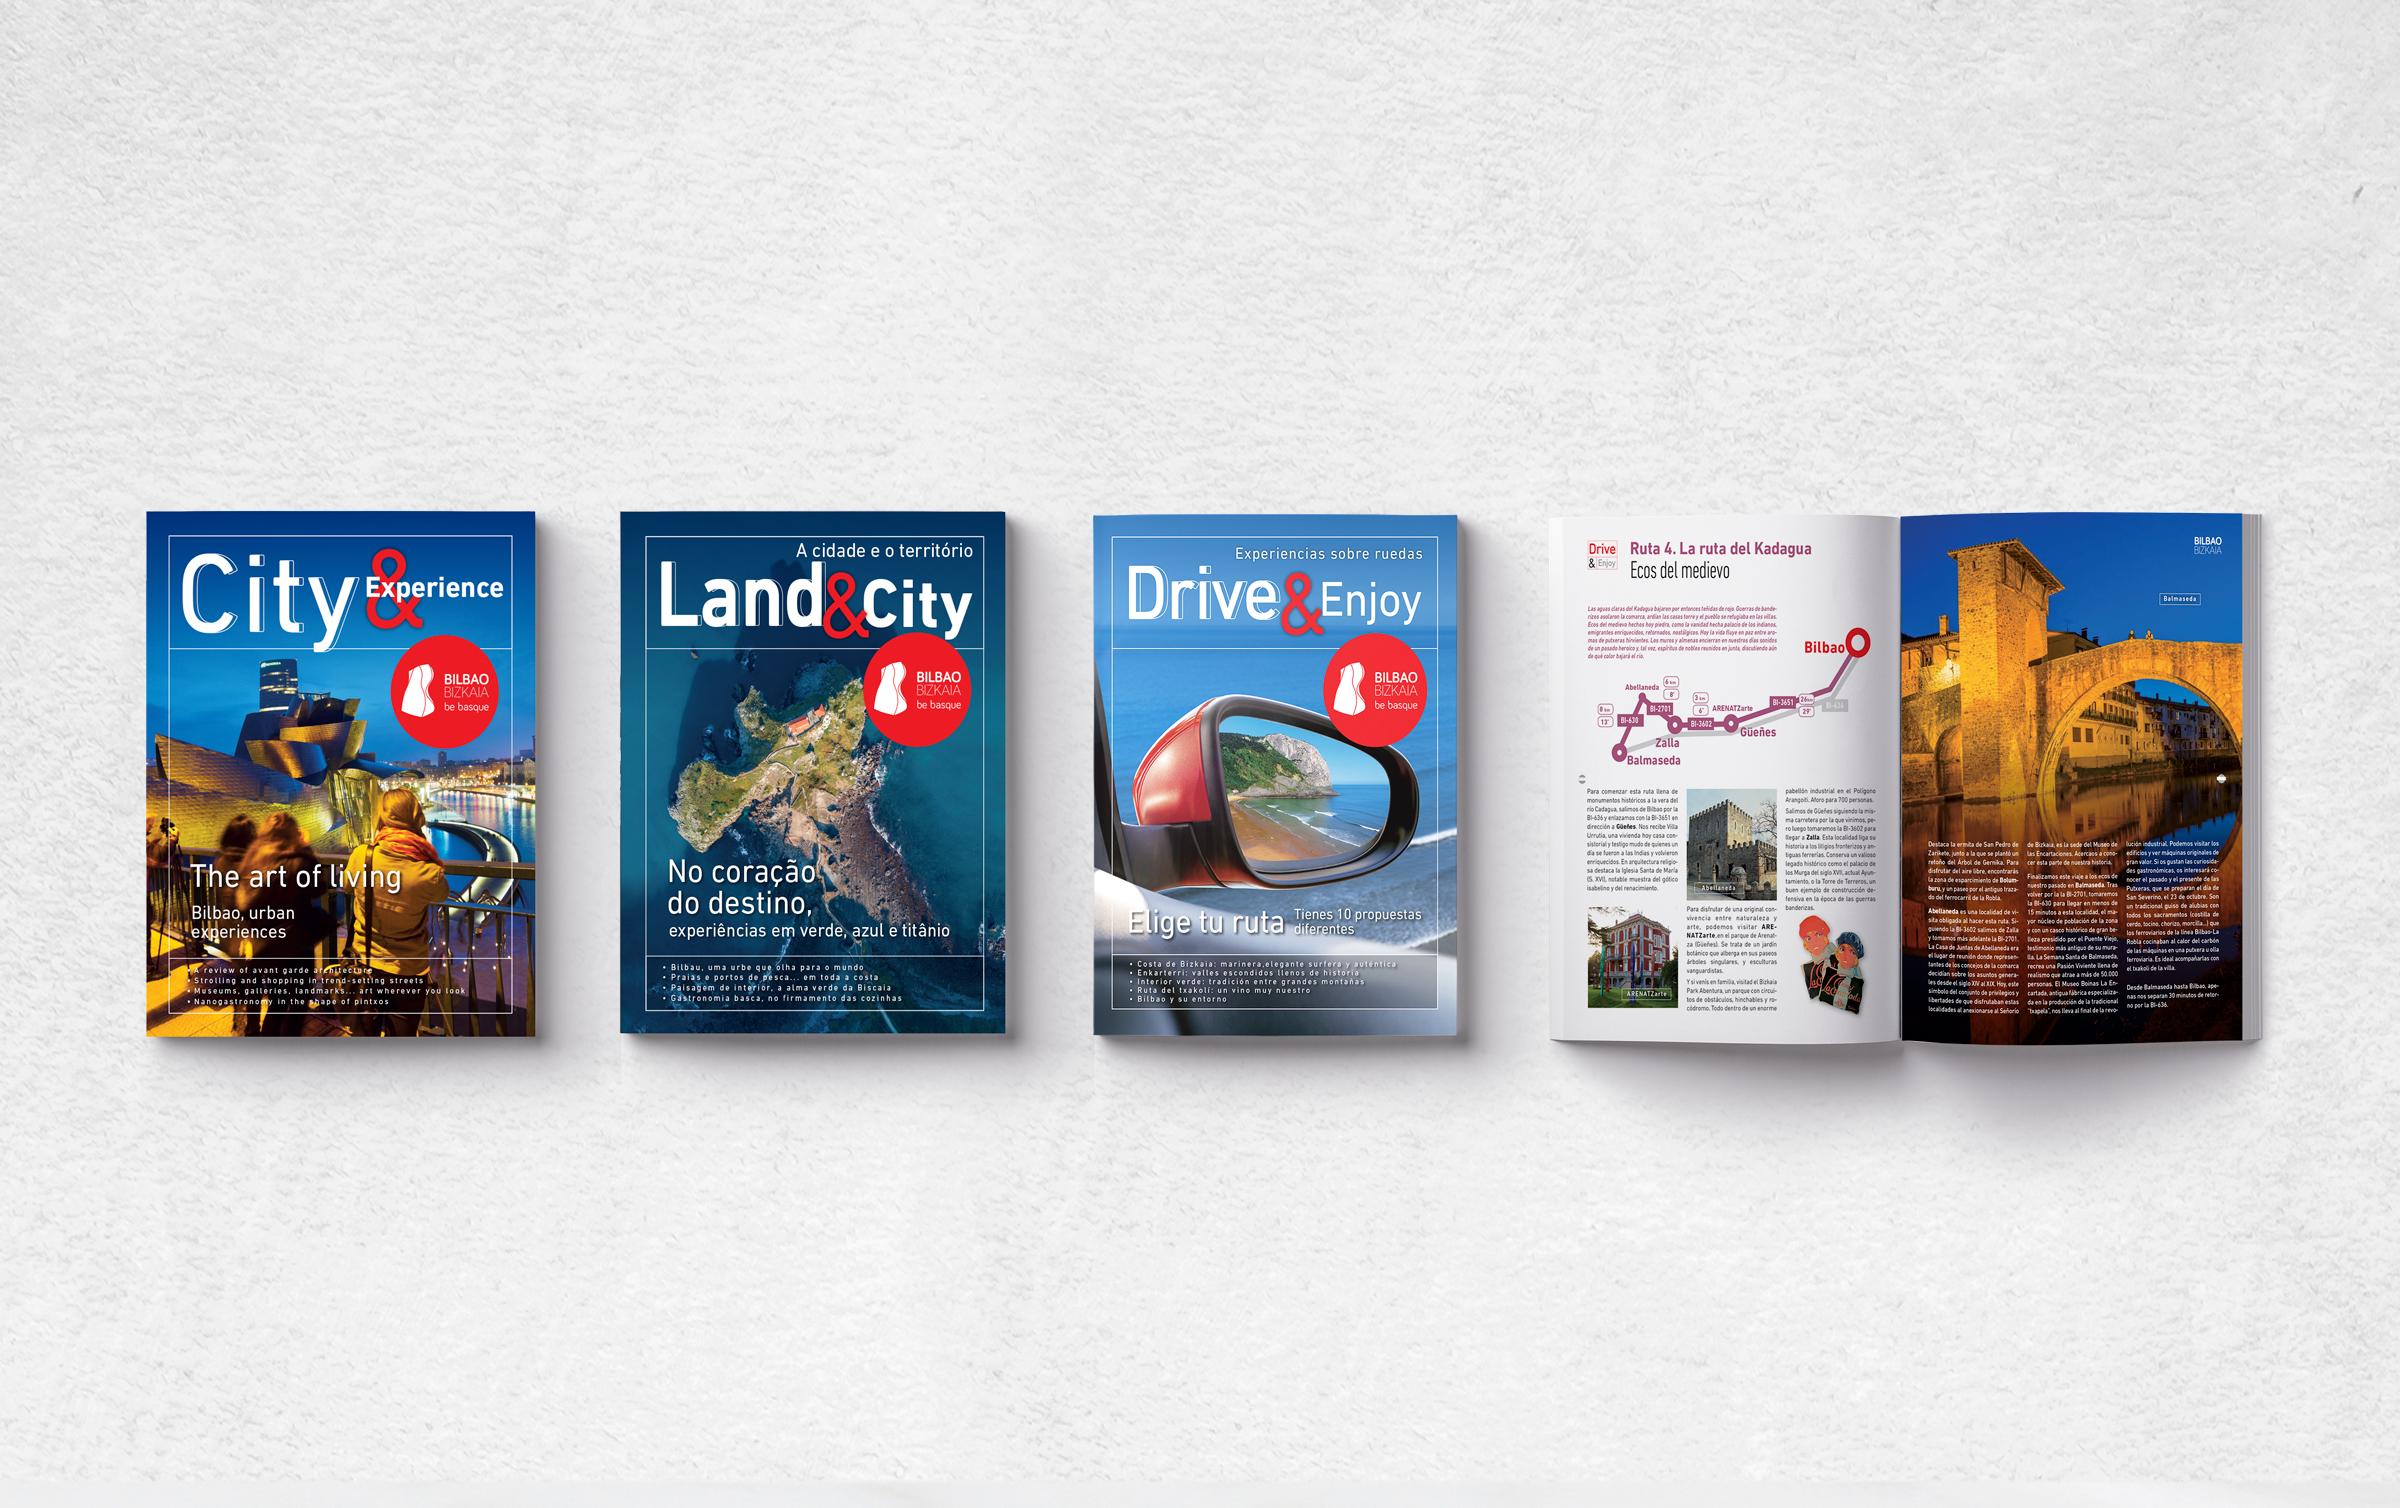 Bilbao Turismo - Folletos-revista turísticos